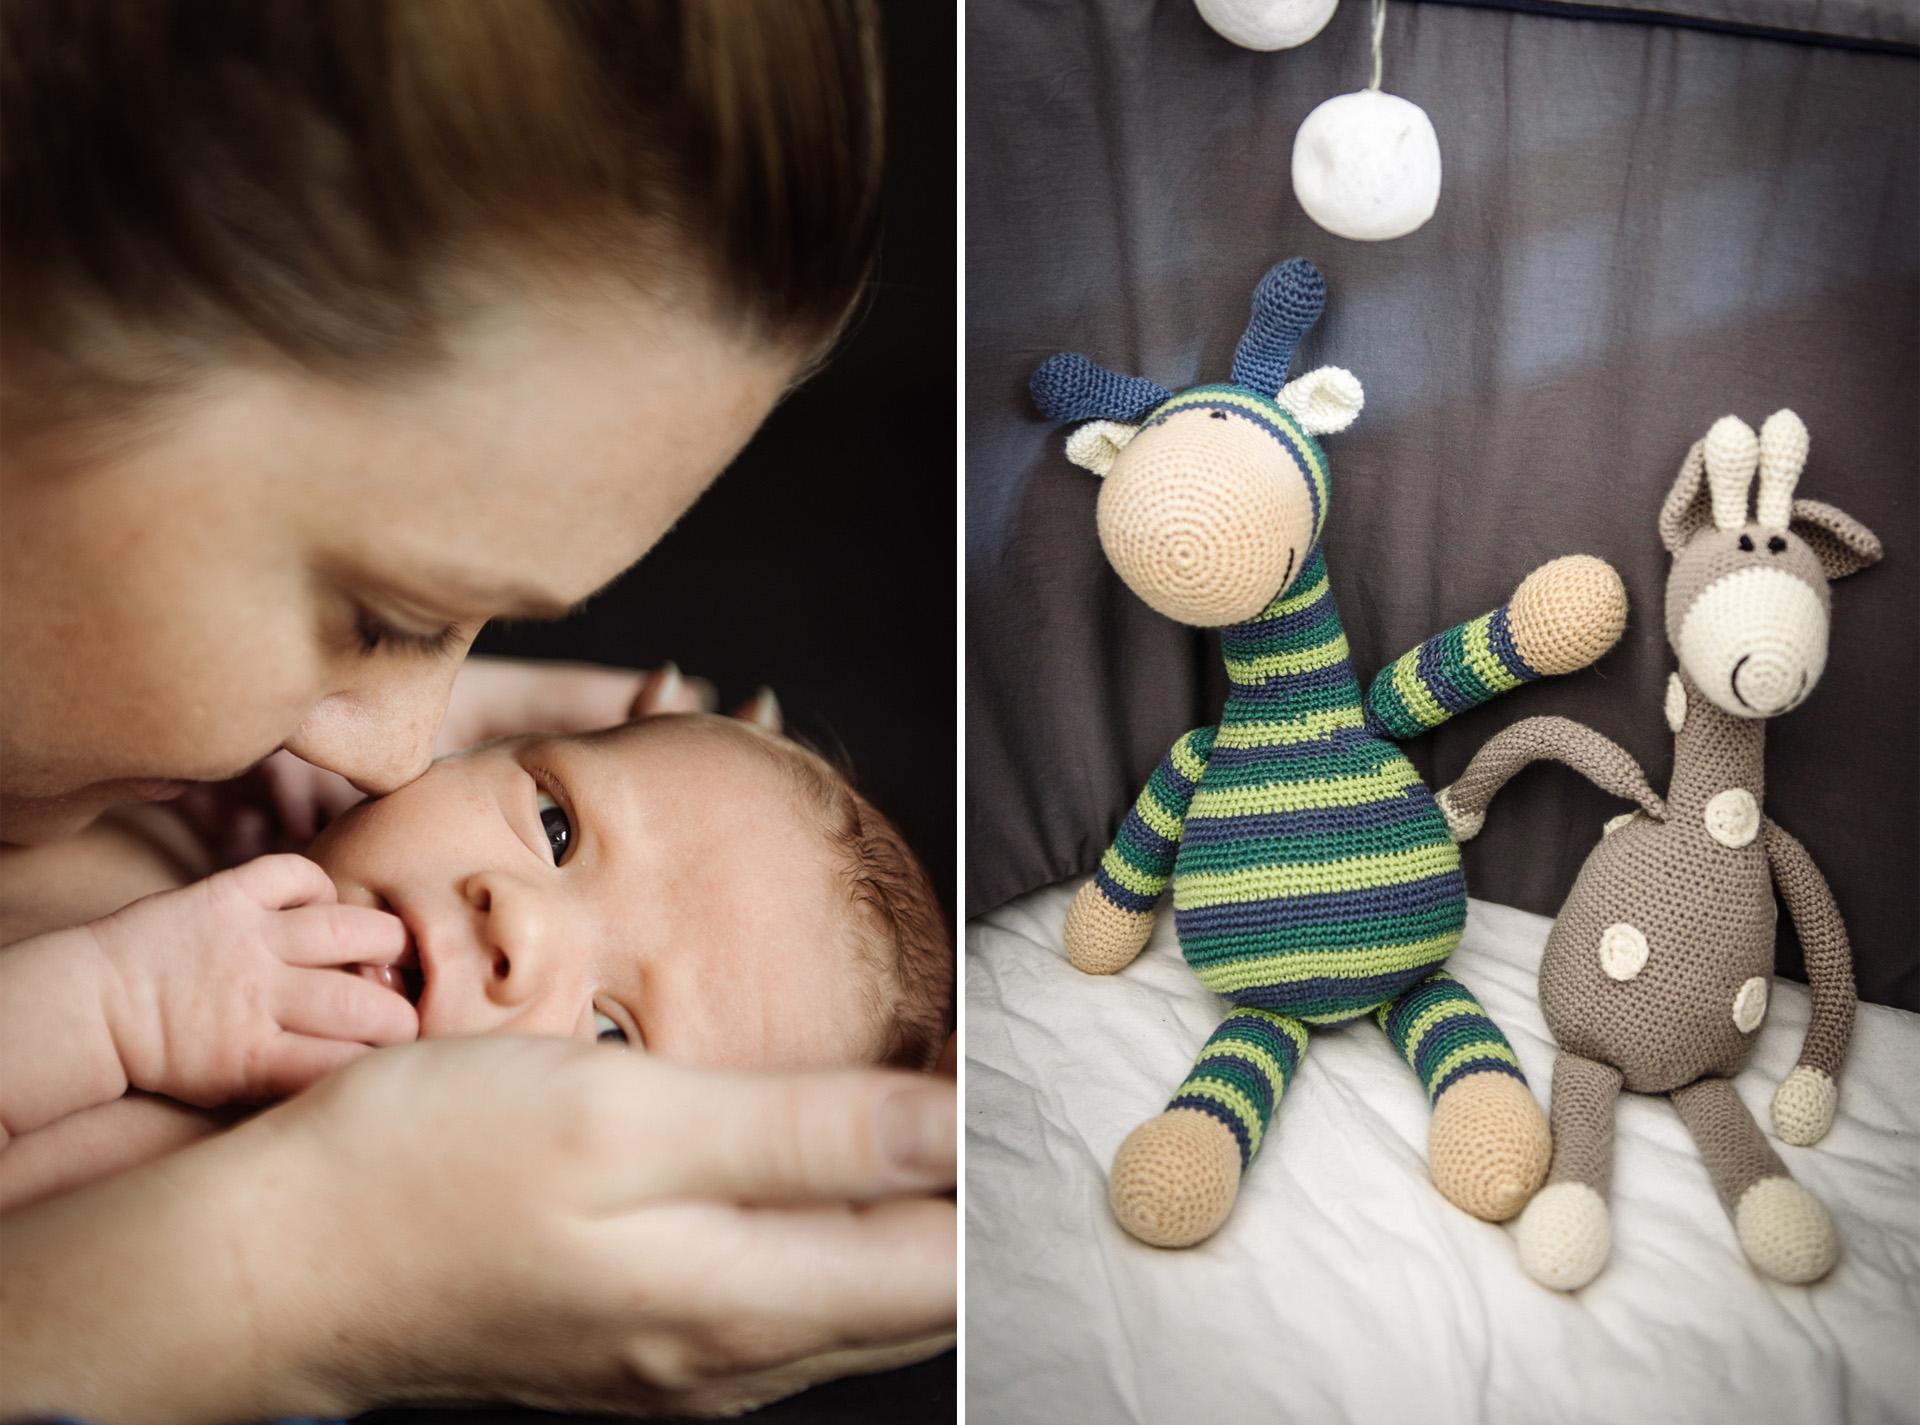 Theo_nyfødt_newborn_baby_28